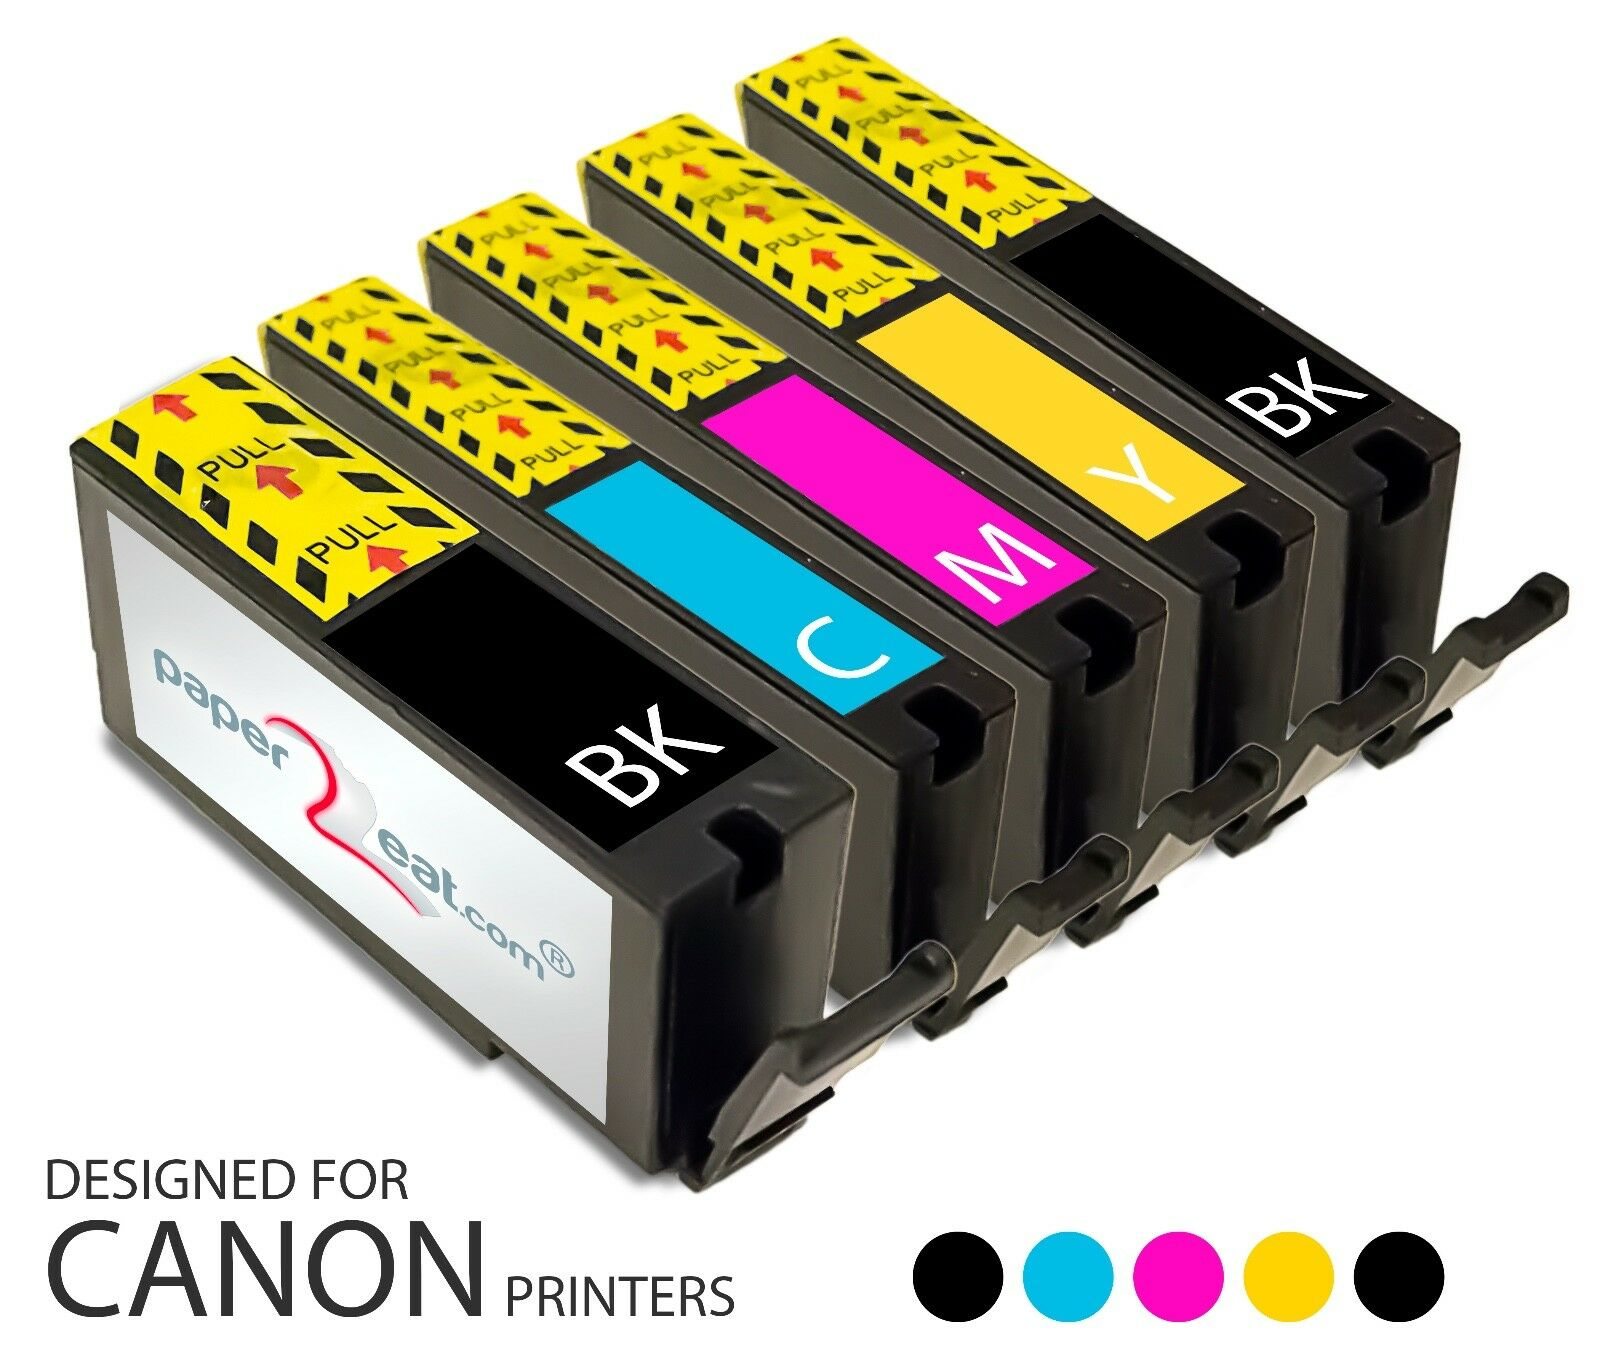 Set of 5 Refillable Edible Ink Cartridges Canon MX712 PGI-225   CLI-226 Series